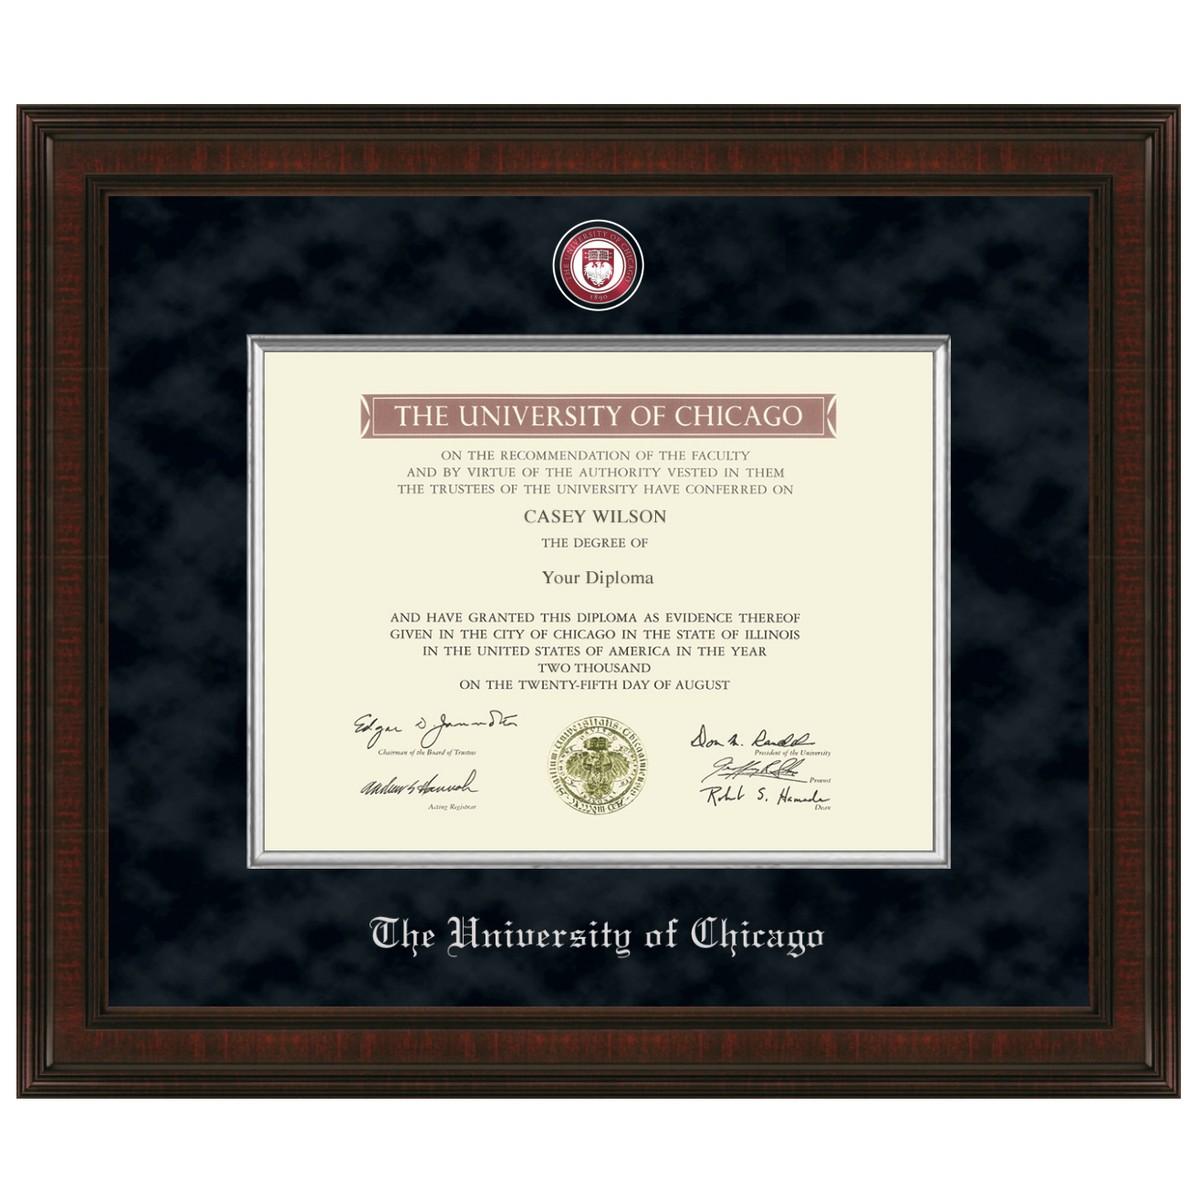 Chicago Diploma Frame Excelsior Graduation Gift